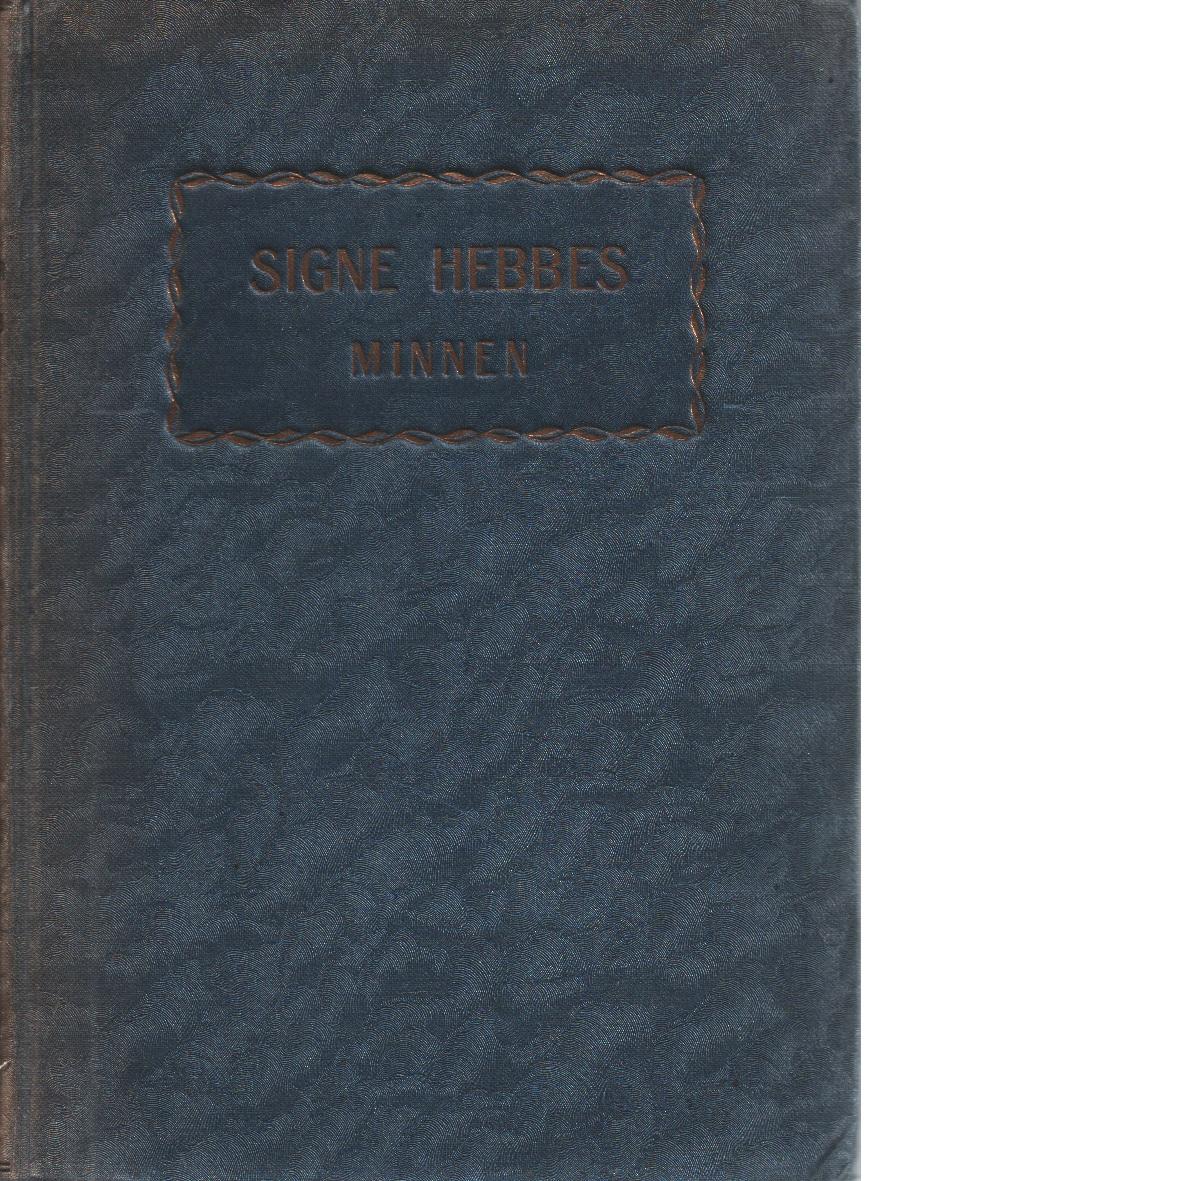 Signe Hebbes minnen - Hebbe, Signe Och Dixelius-brettner, Hildur